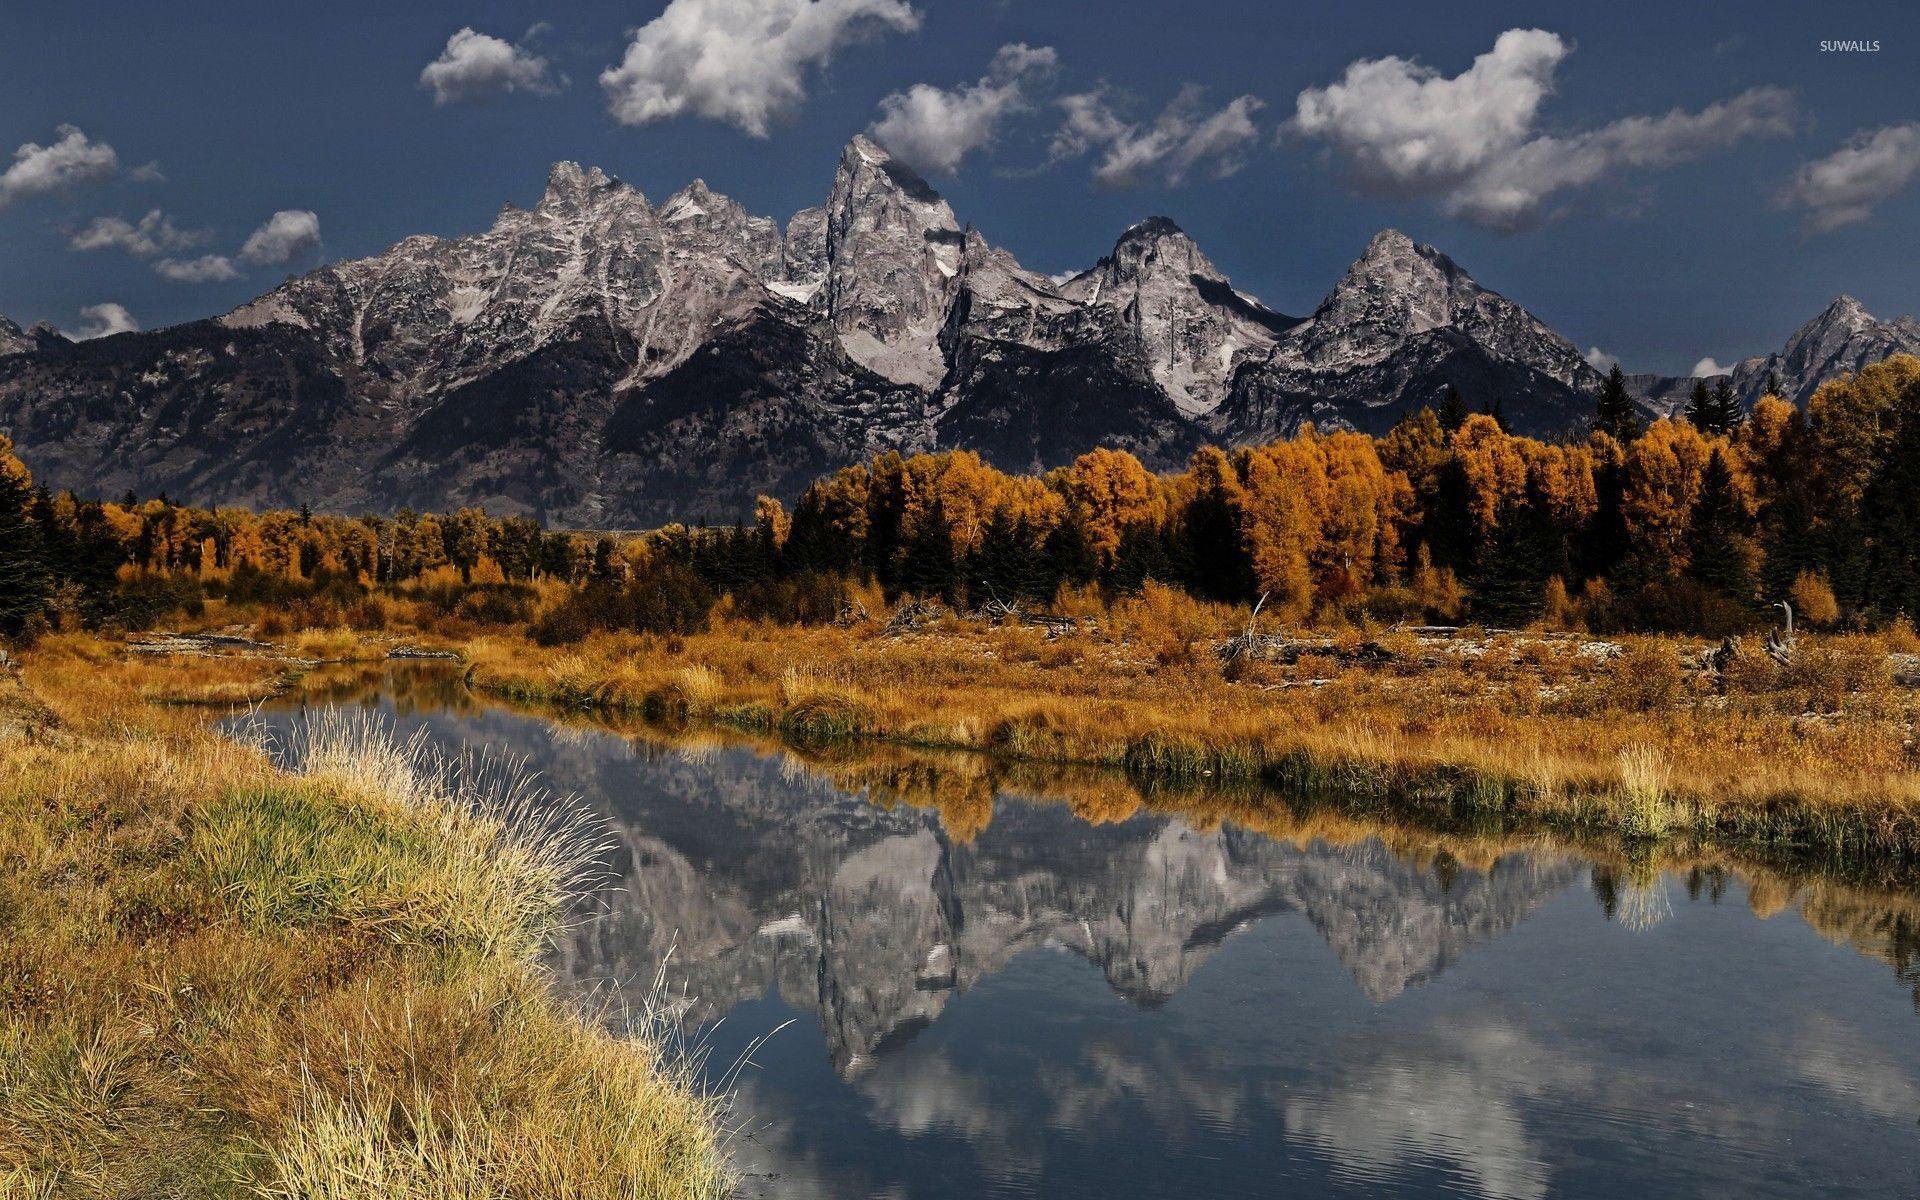 Grand Teton Wallpapers Top Free Grand Teton Backgrounds